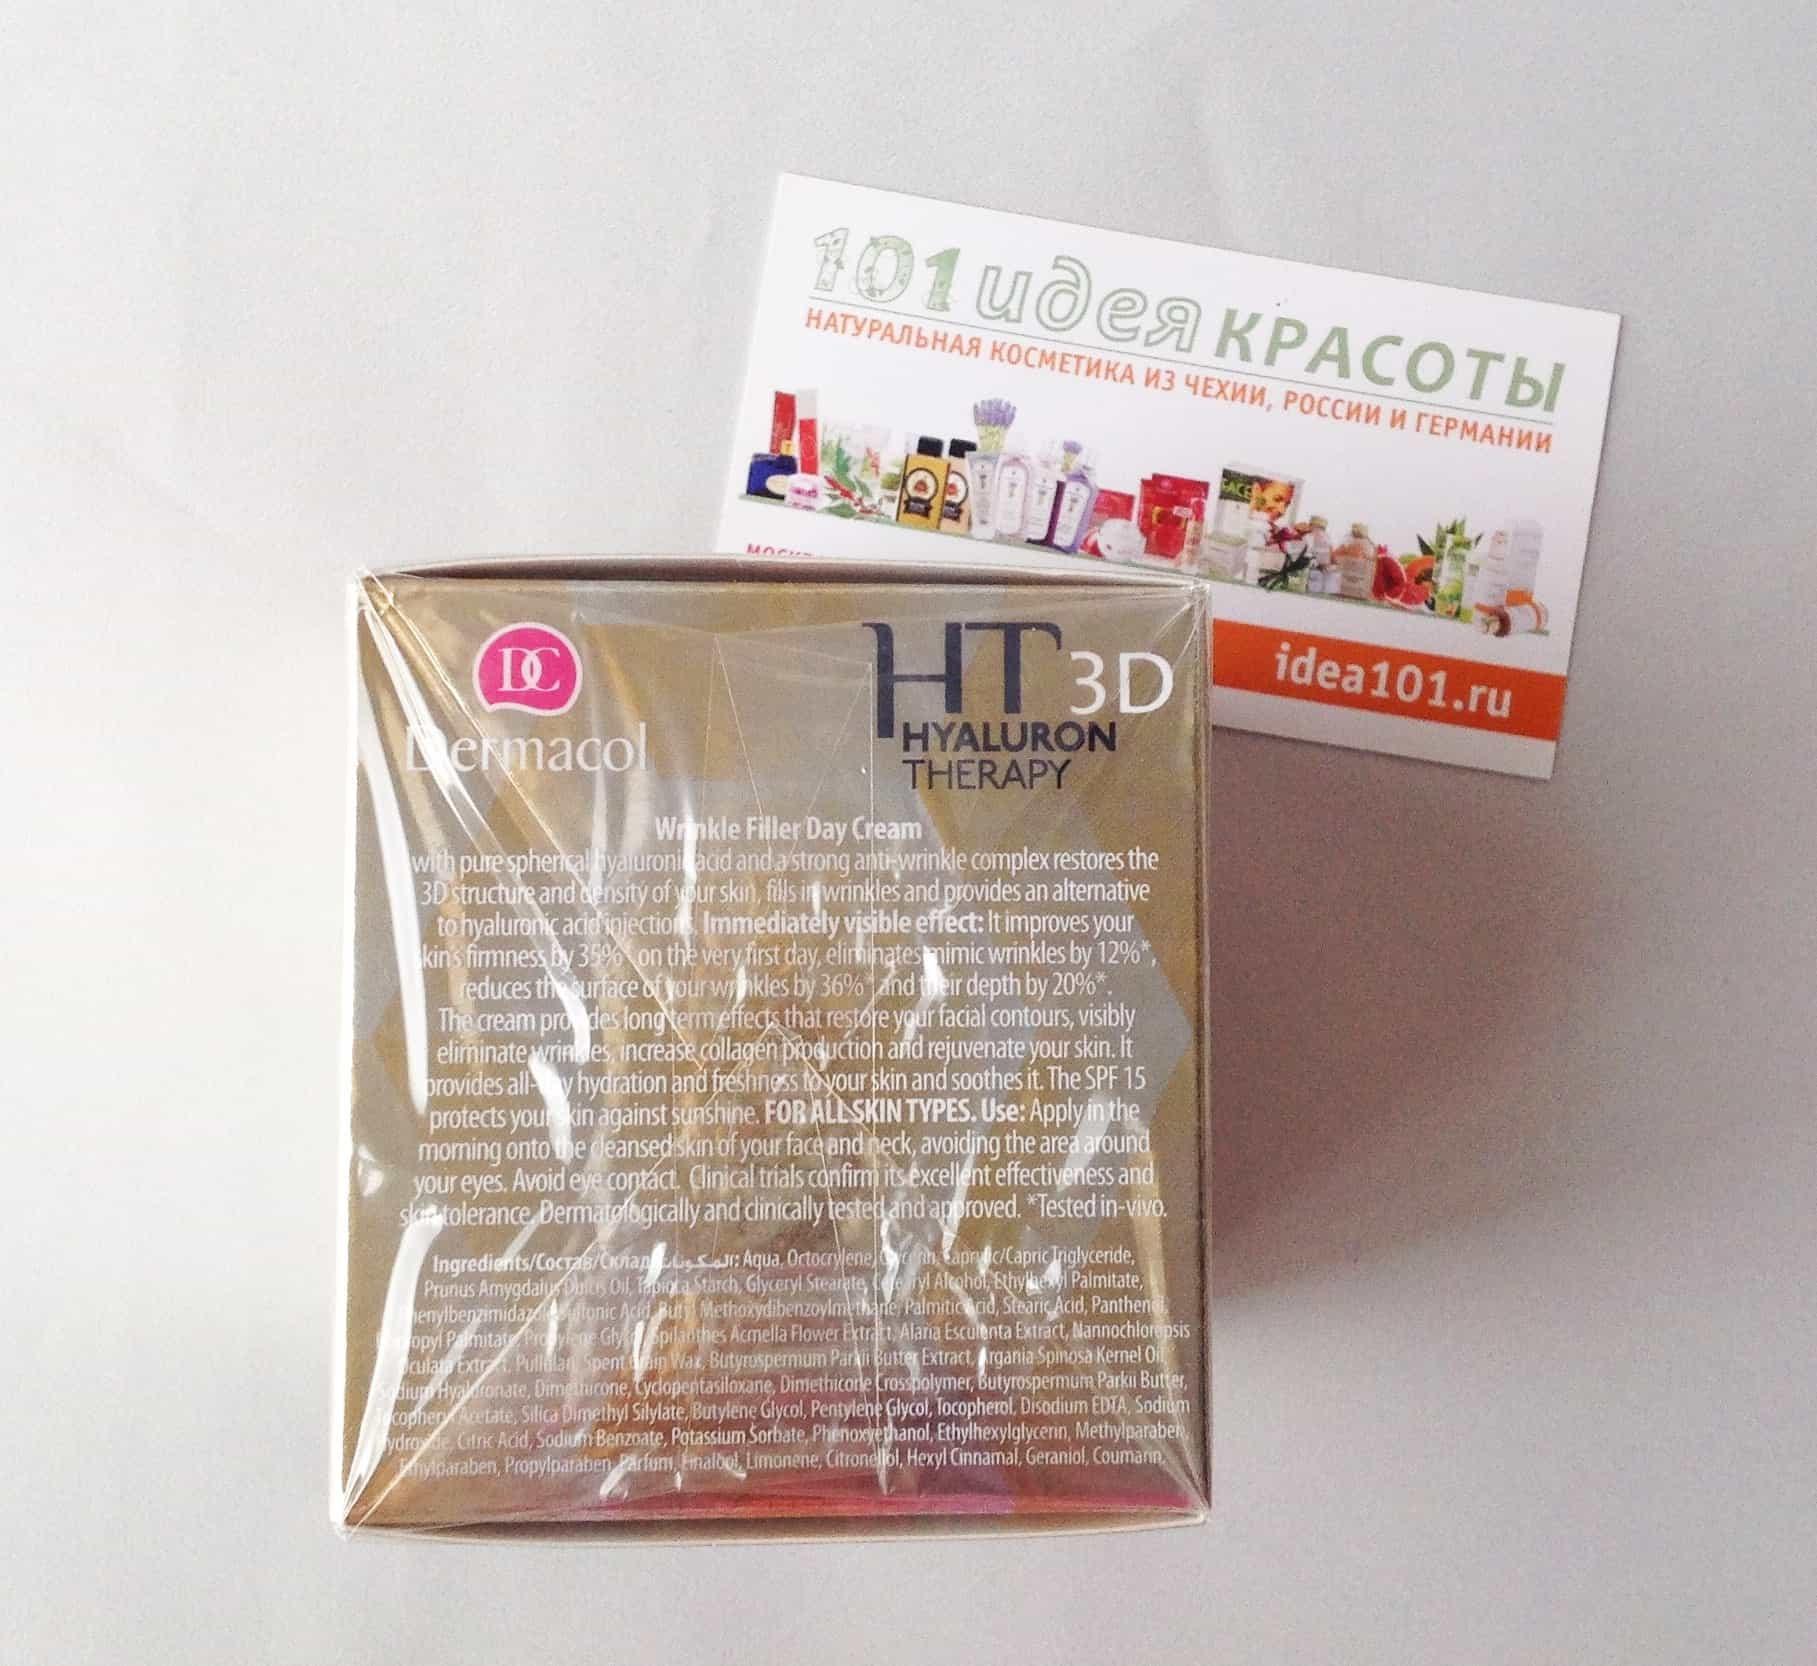 Dermacol Hyaluron Therapy 3D Дневной уход, заполняющий морщины с гиалуроновой кислотой (40+), 50мл